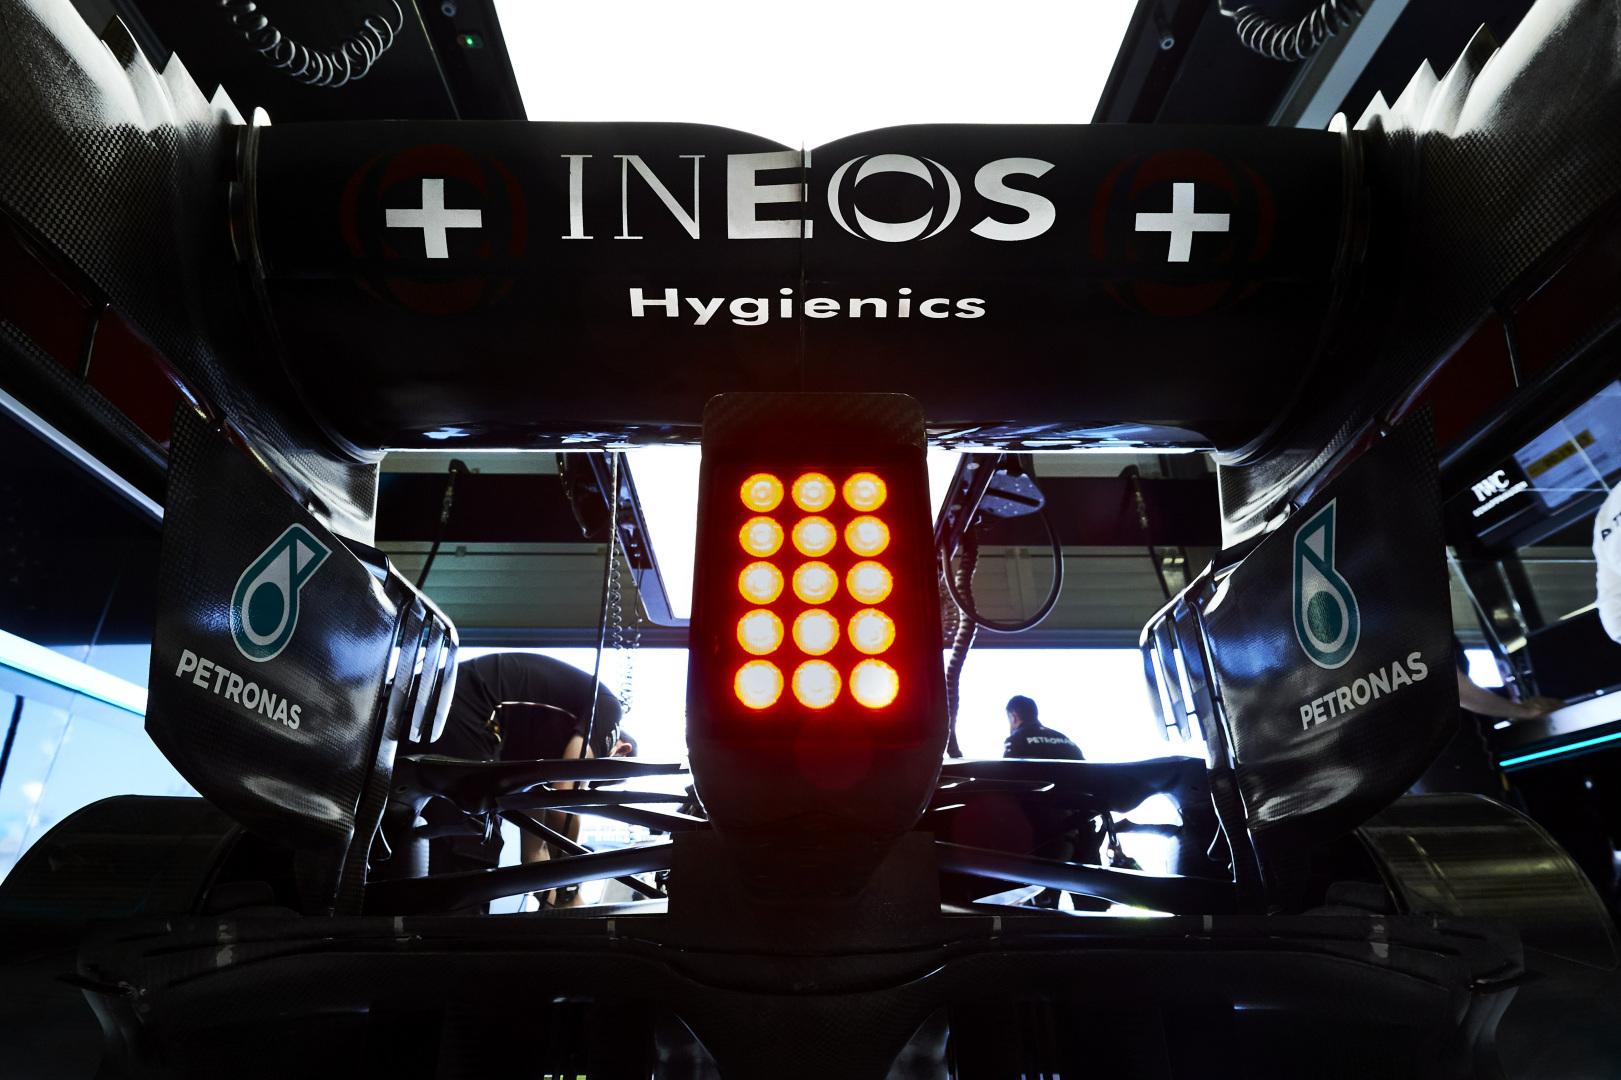 mercedes-ineos-f1-rumeur